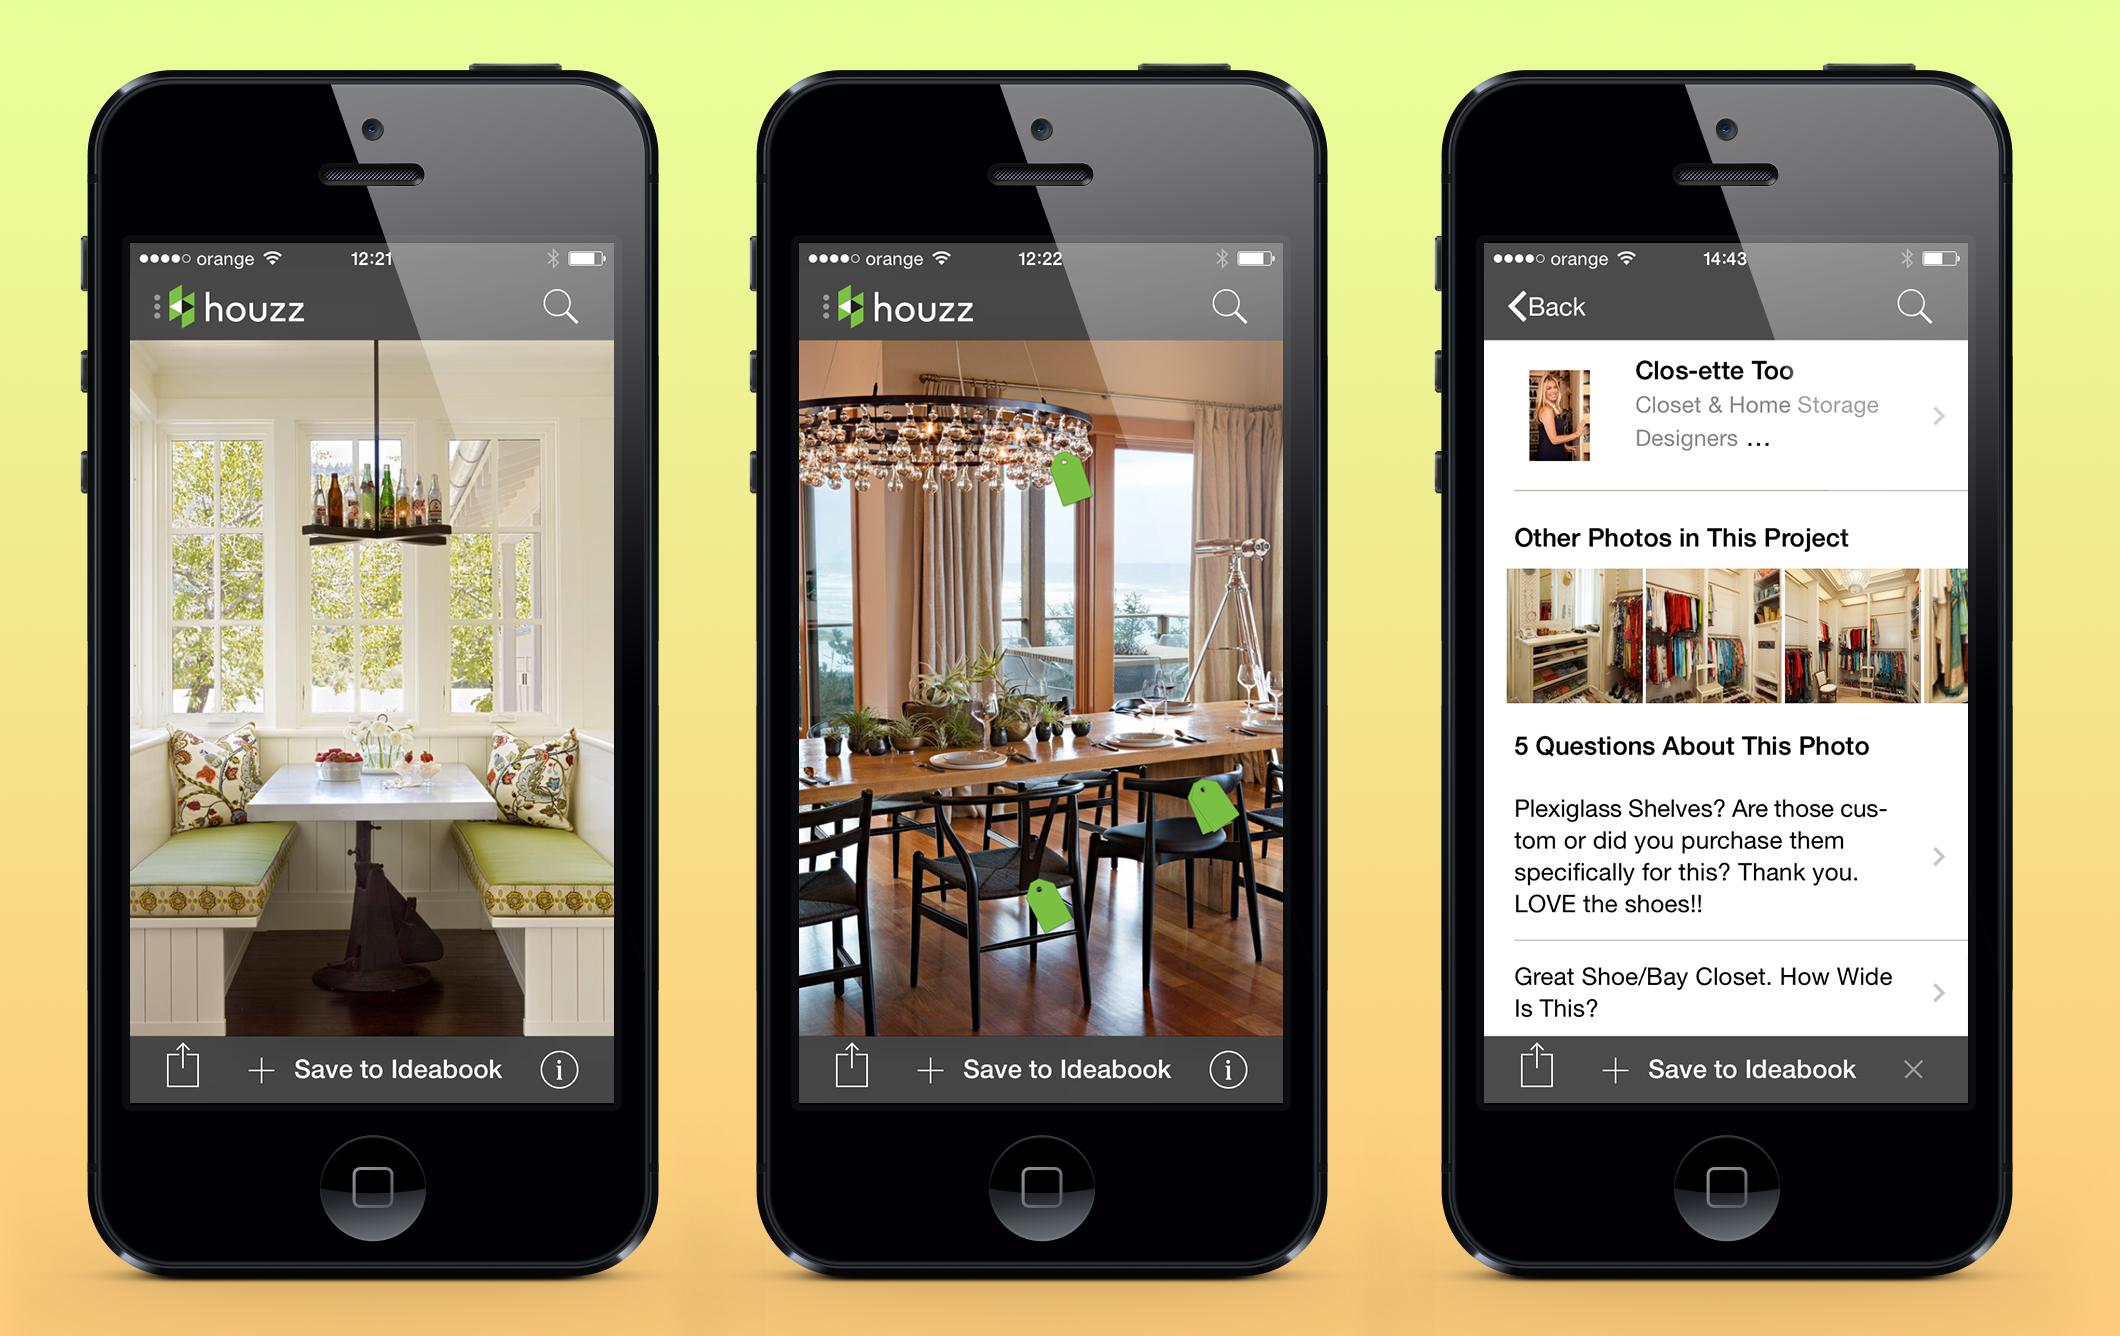 Houzz Interior Design Ideas  Decoration app. 3 mobile apps for home improvement